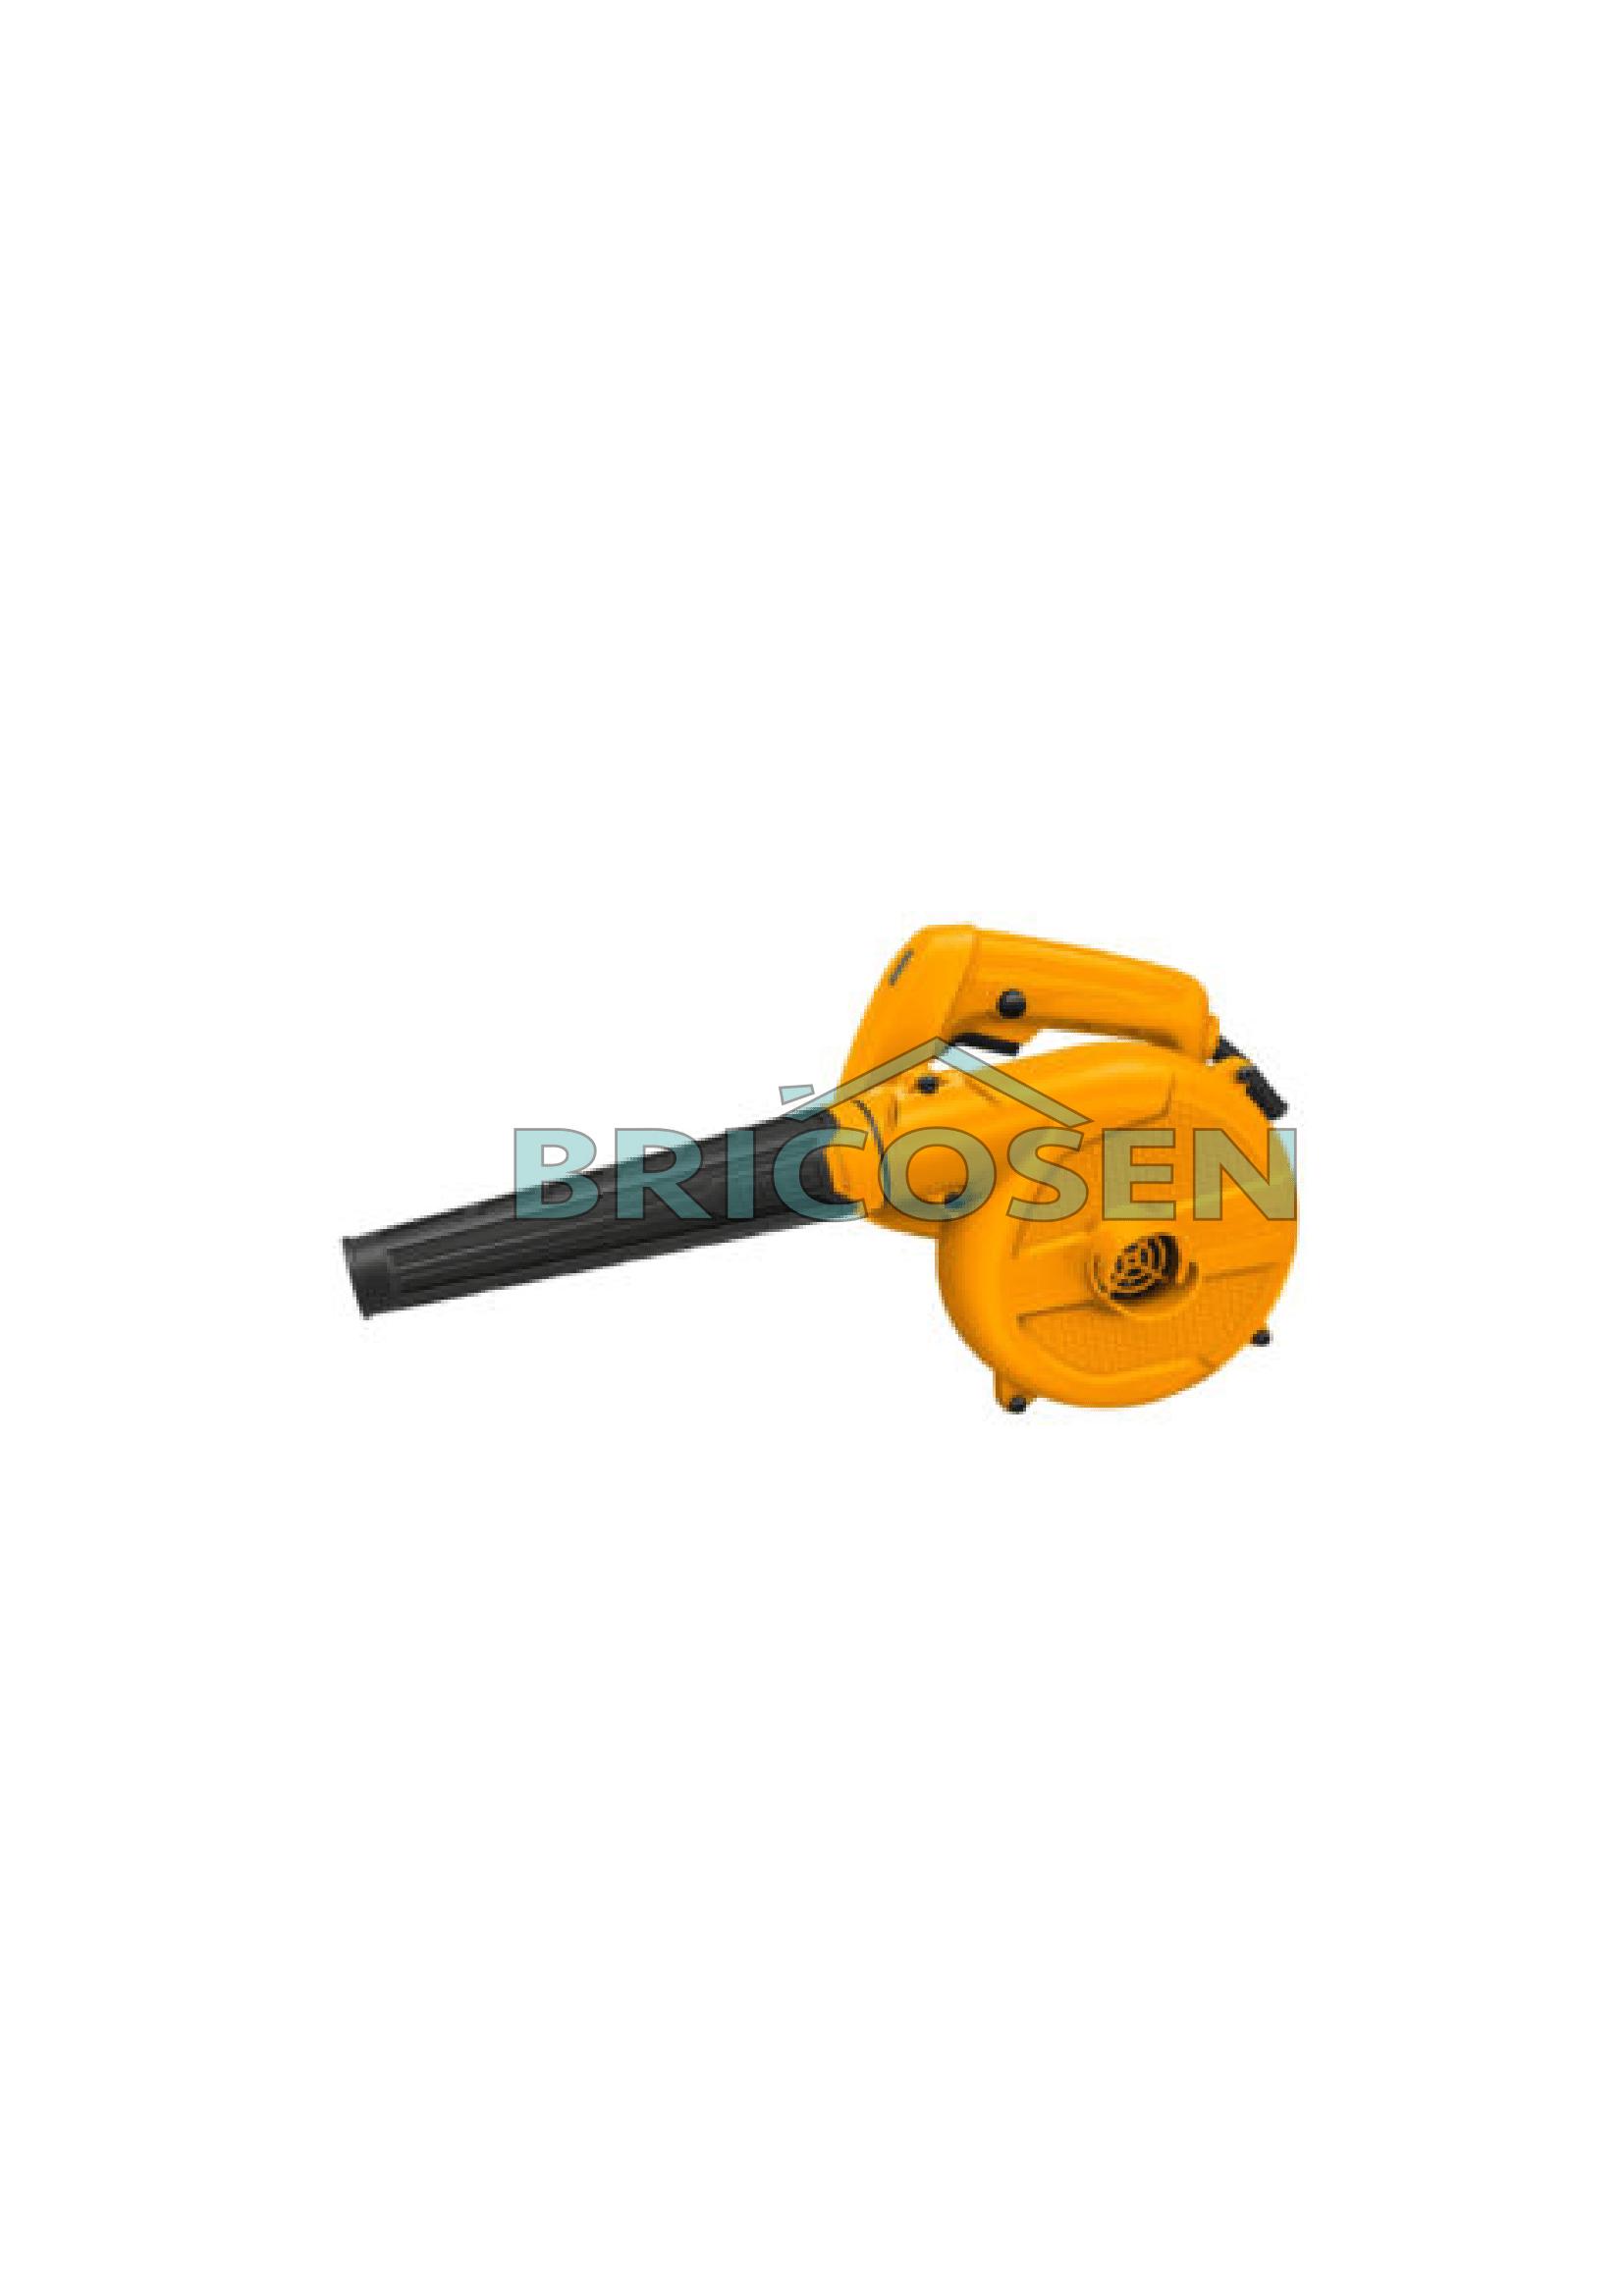 aspirateur souffleur 400w ingco ab4018 bricosen quincaillerie senegal